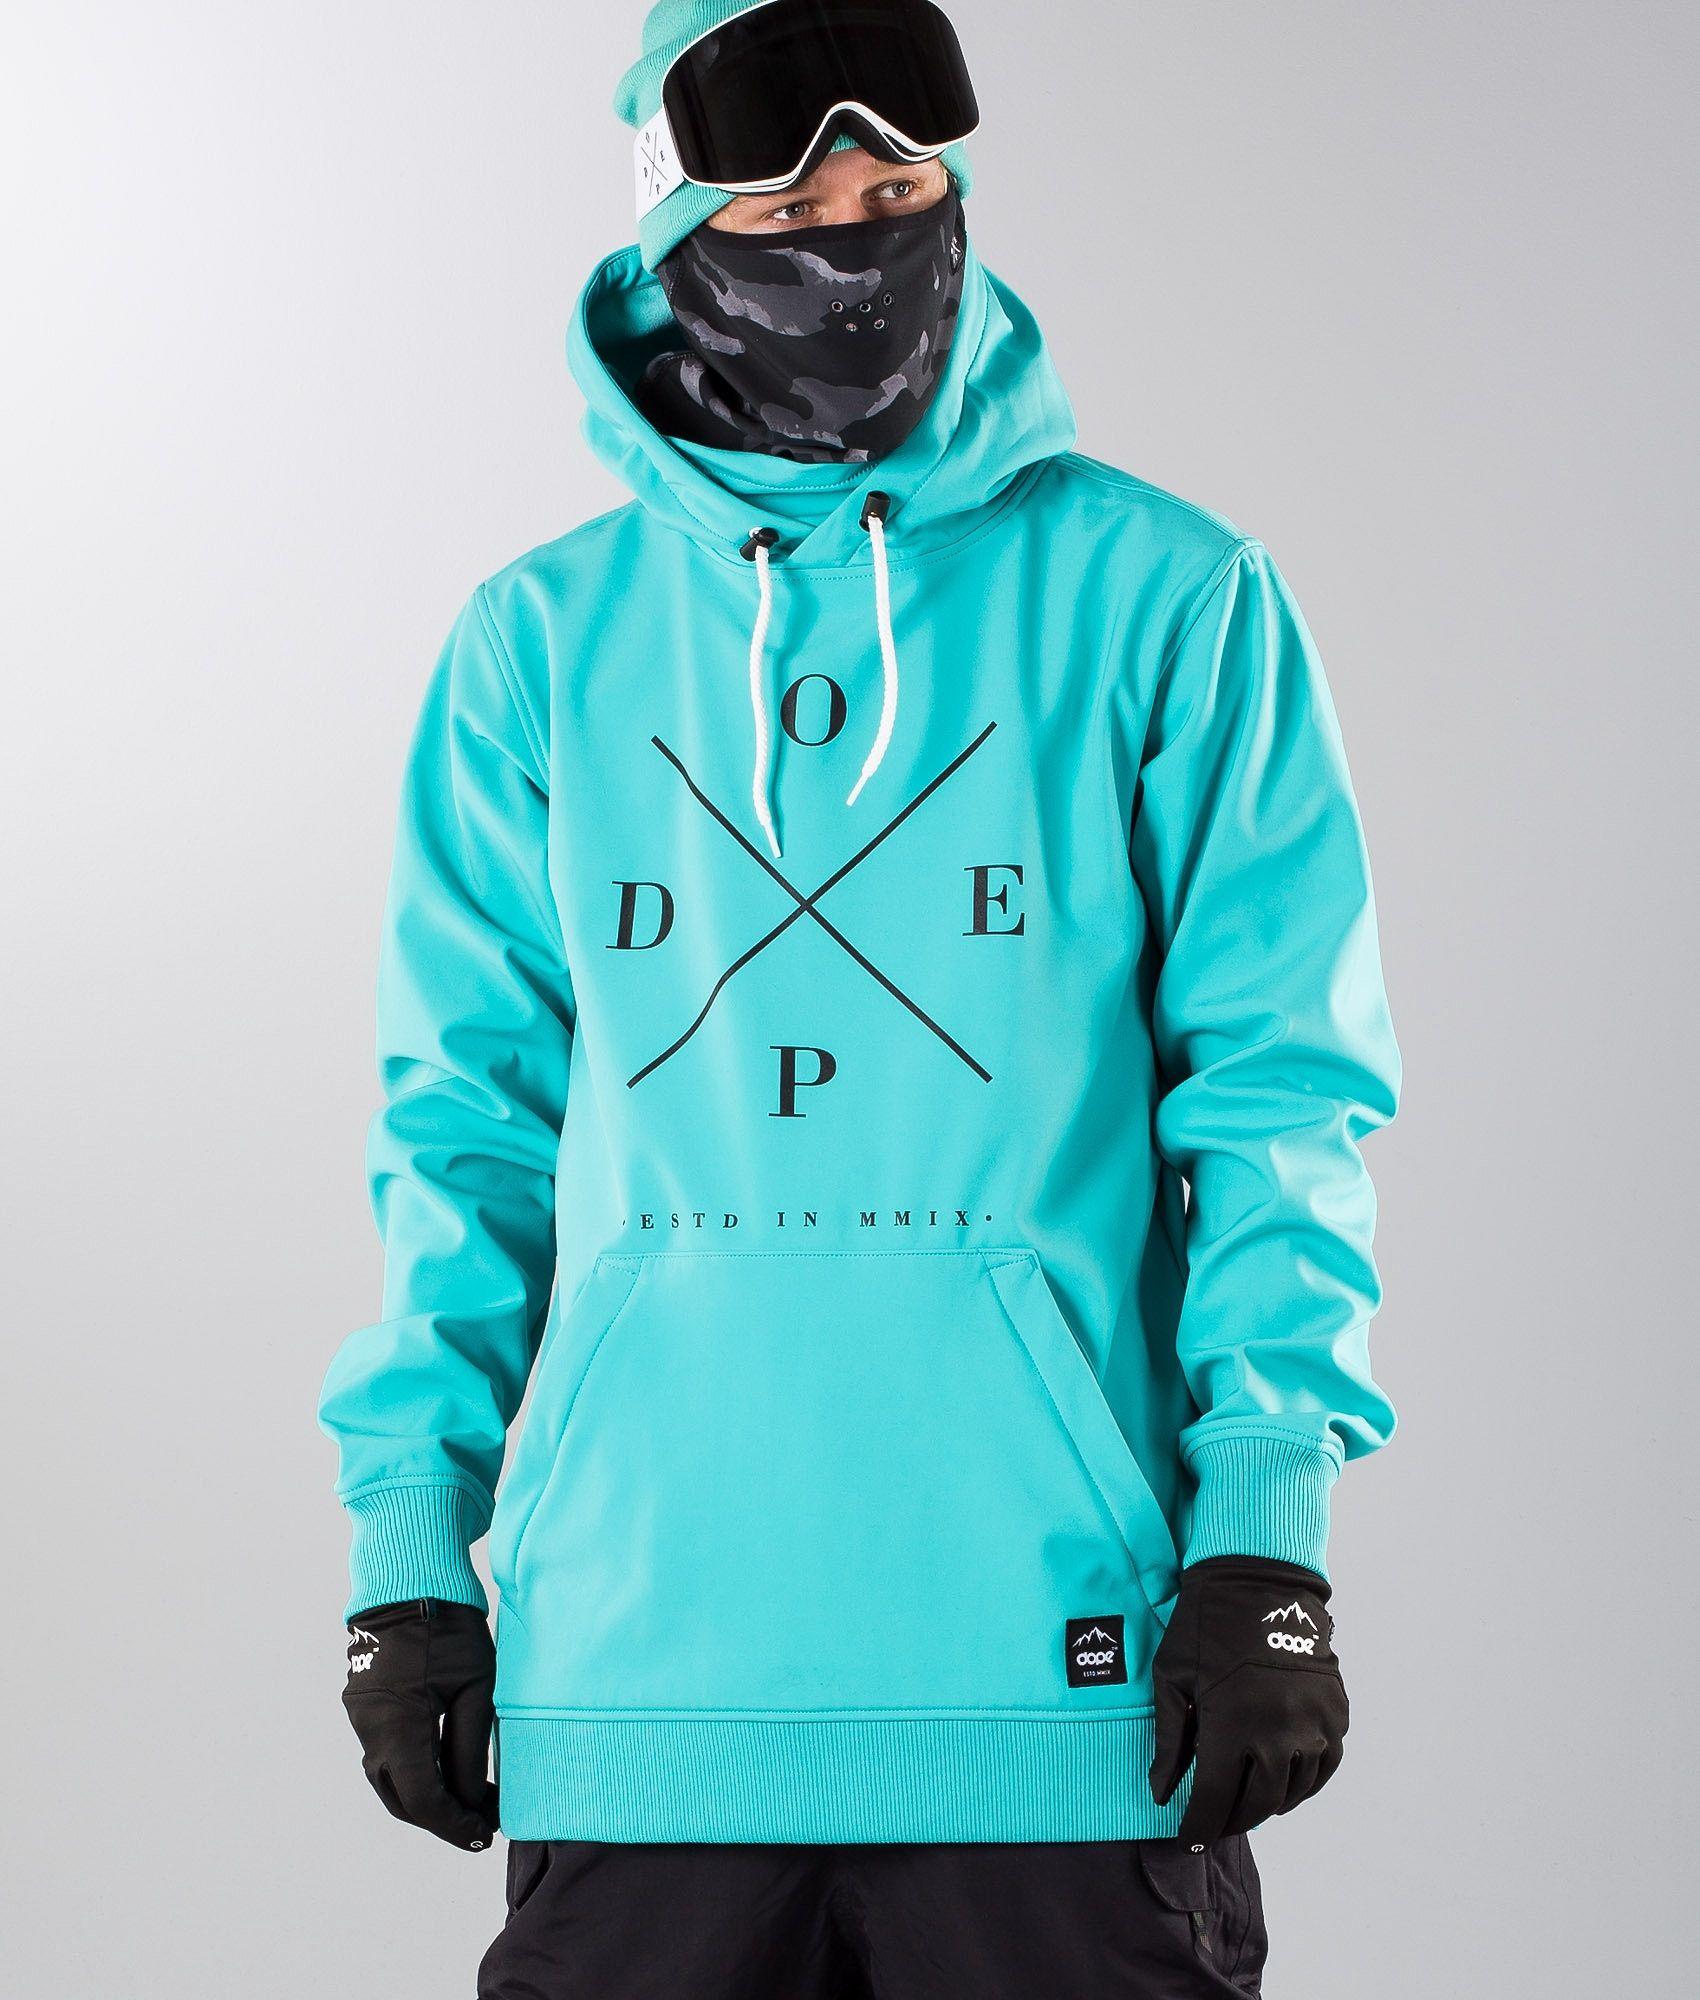 snowboard gear mens ski outfit for men | Mens ski clothes